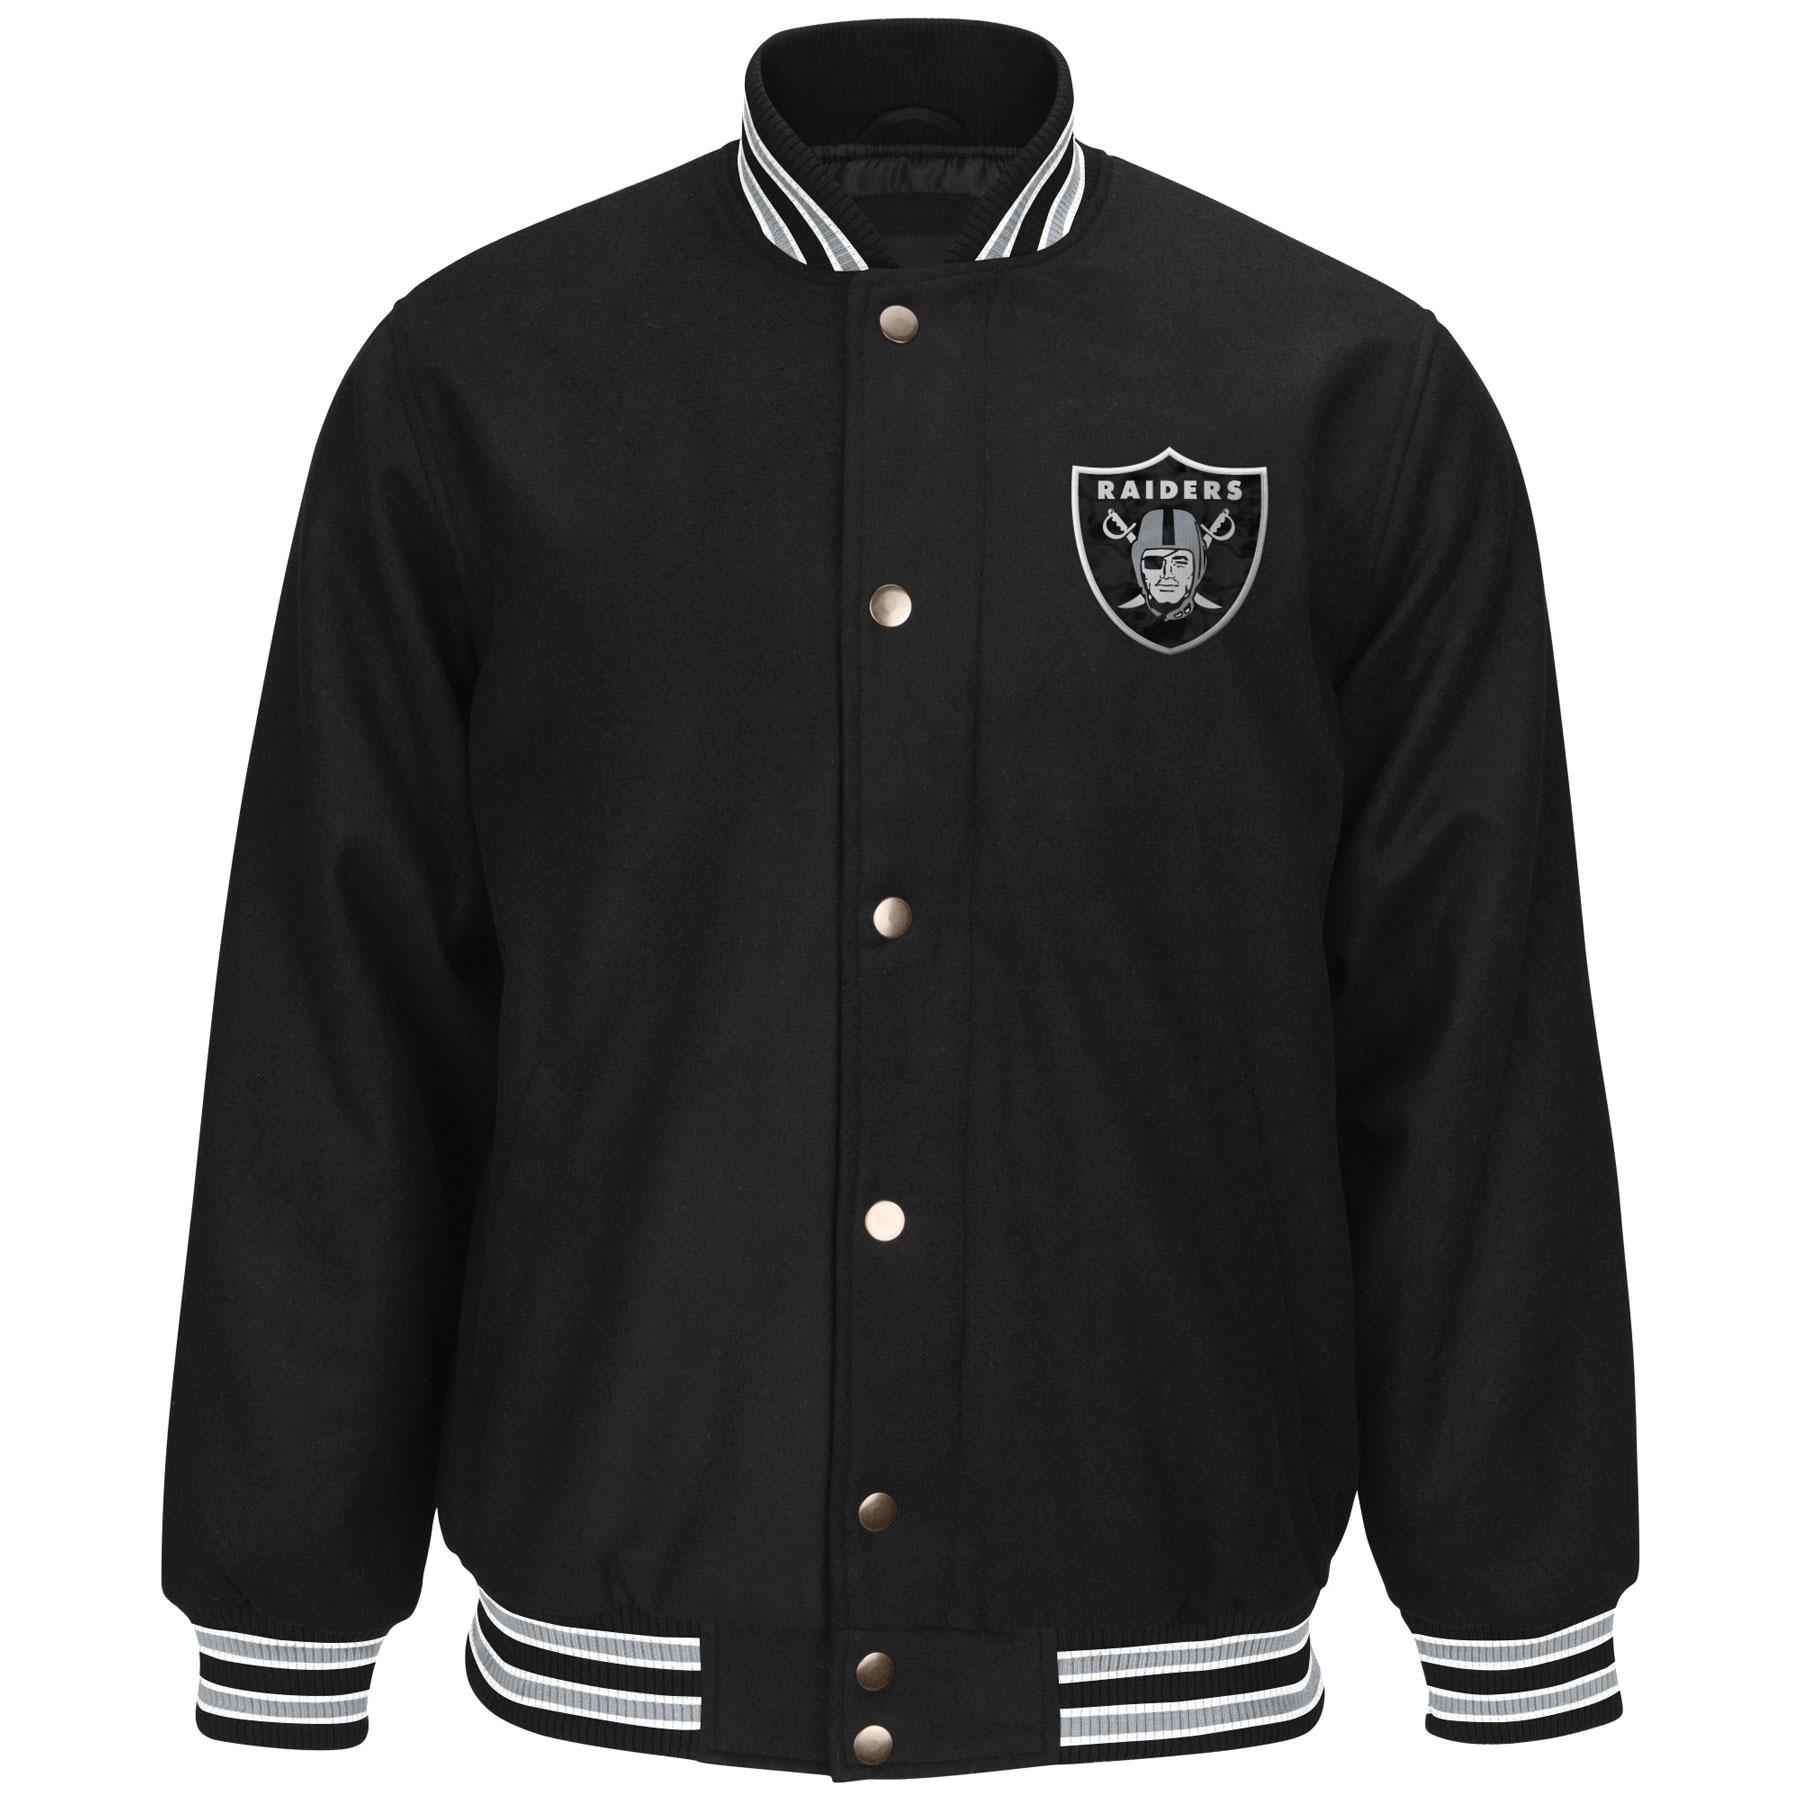 Raider Leather Motorcycle Jacket | Raiders Varsity Jacket | Oakland Raiders Boots